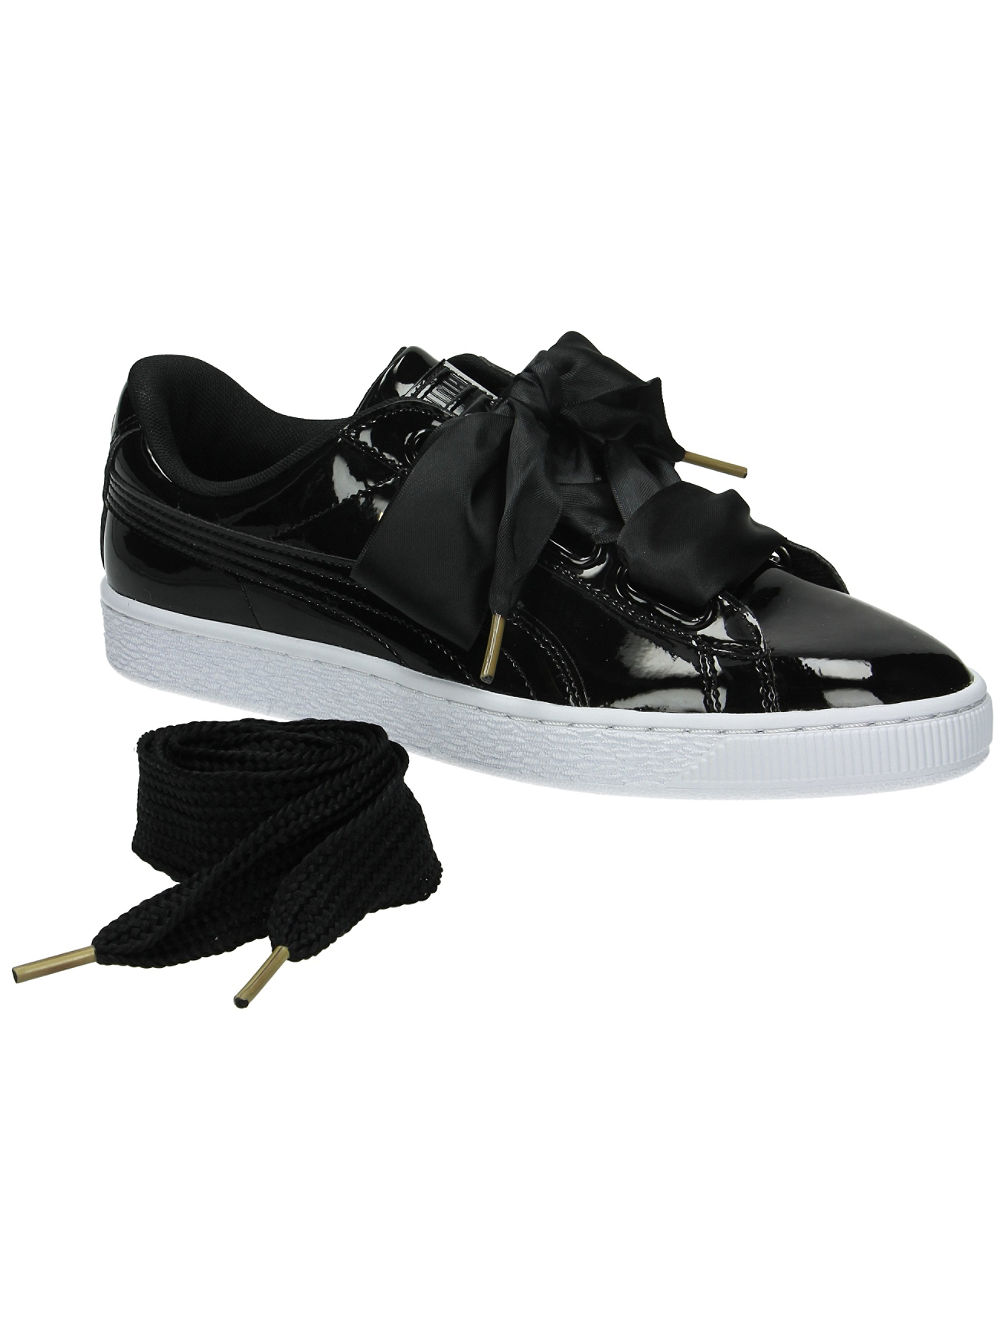 compra puma basket heart patent zapatillas deportivas para. Black Bedroom Furniture Sets. Home Design Ideas